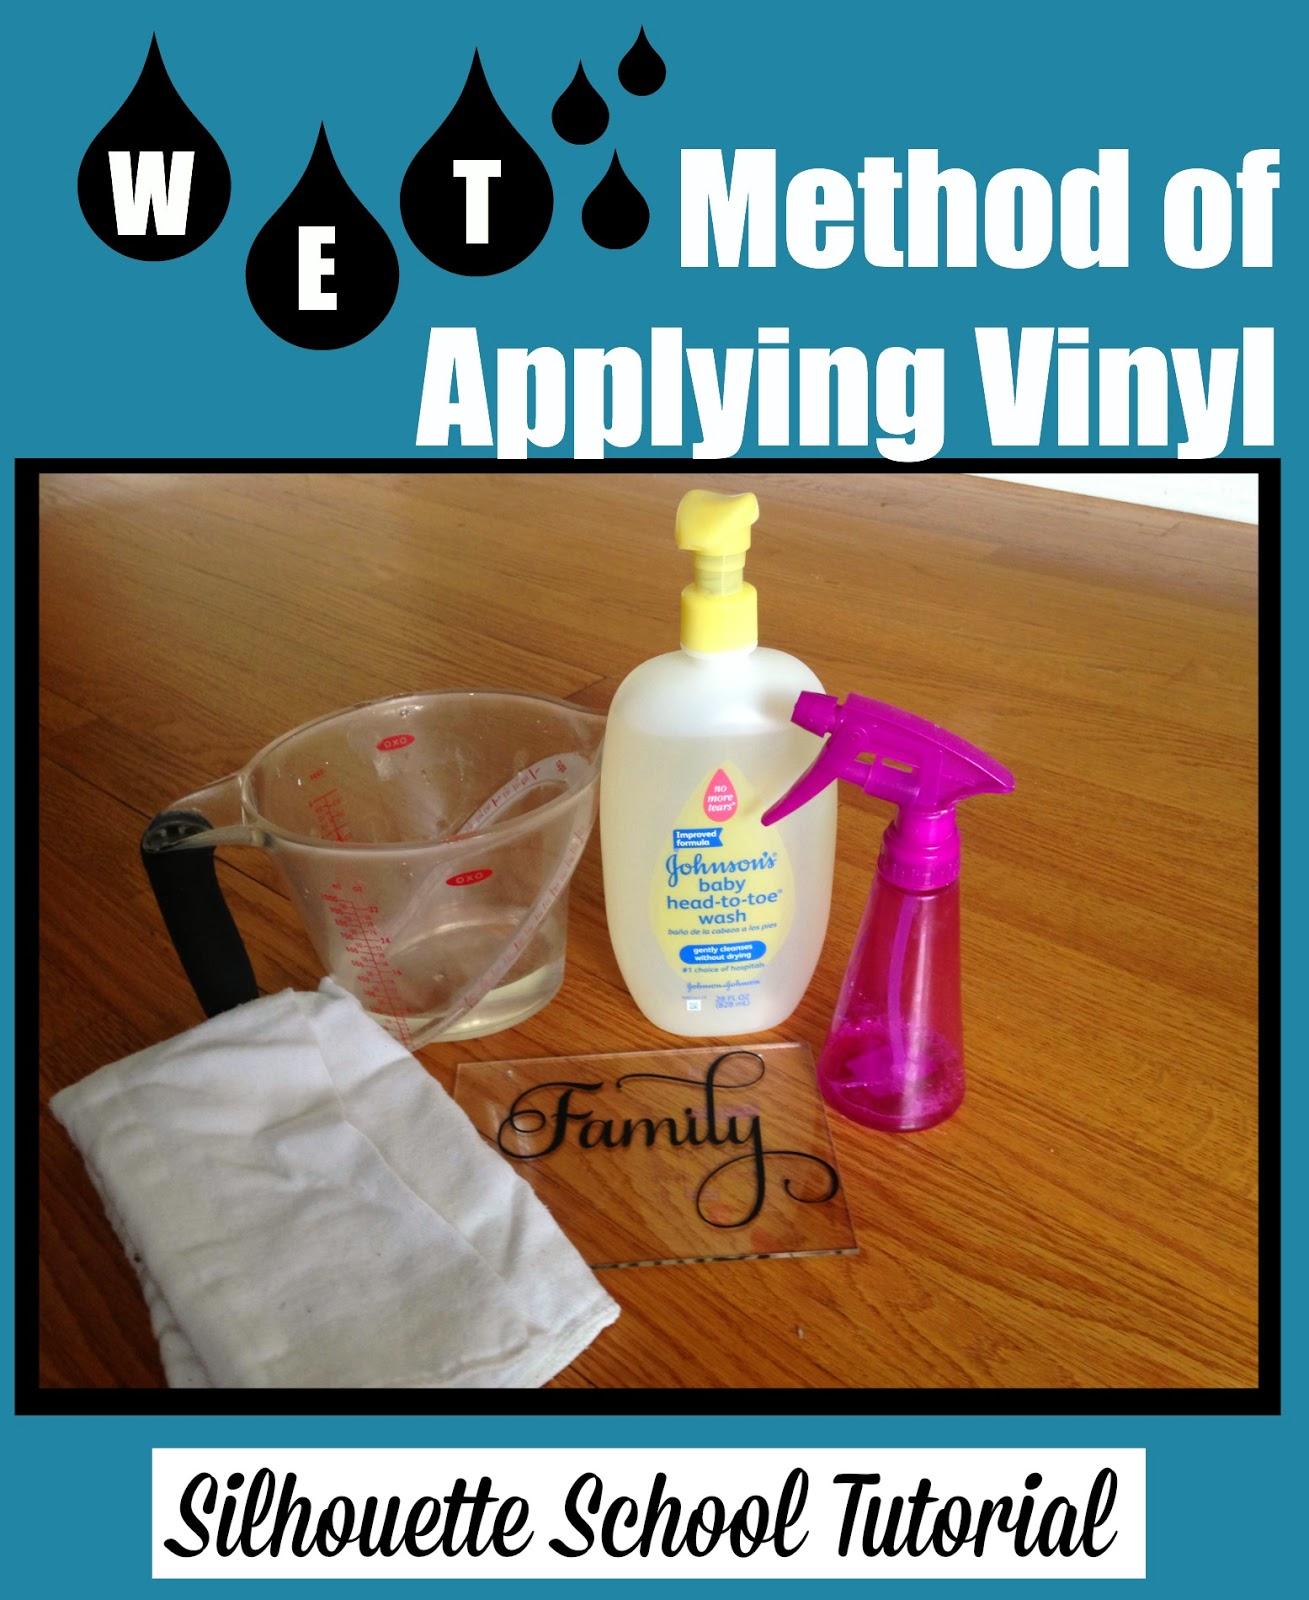 Silhouette tutorial, vinyl, wet method, applying